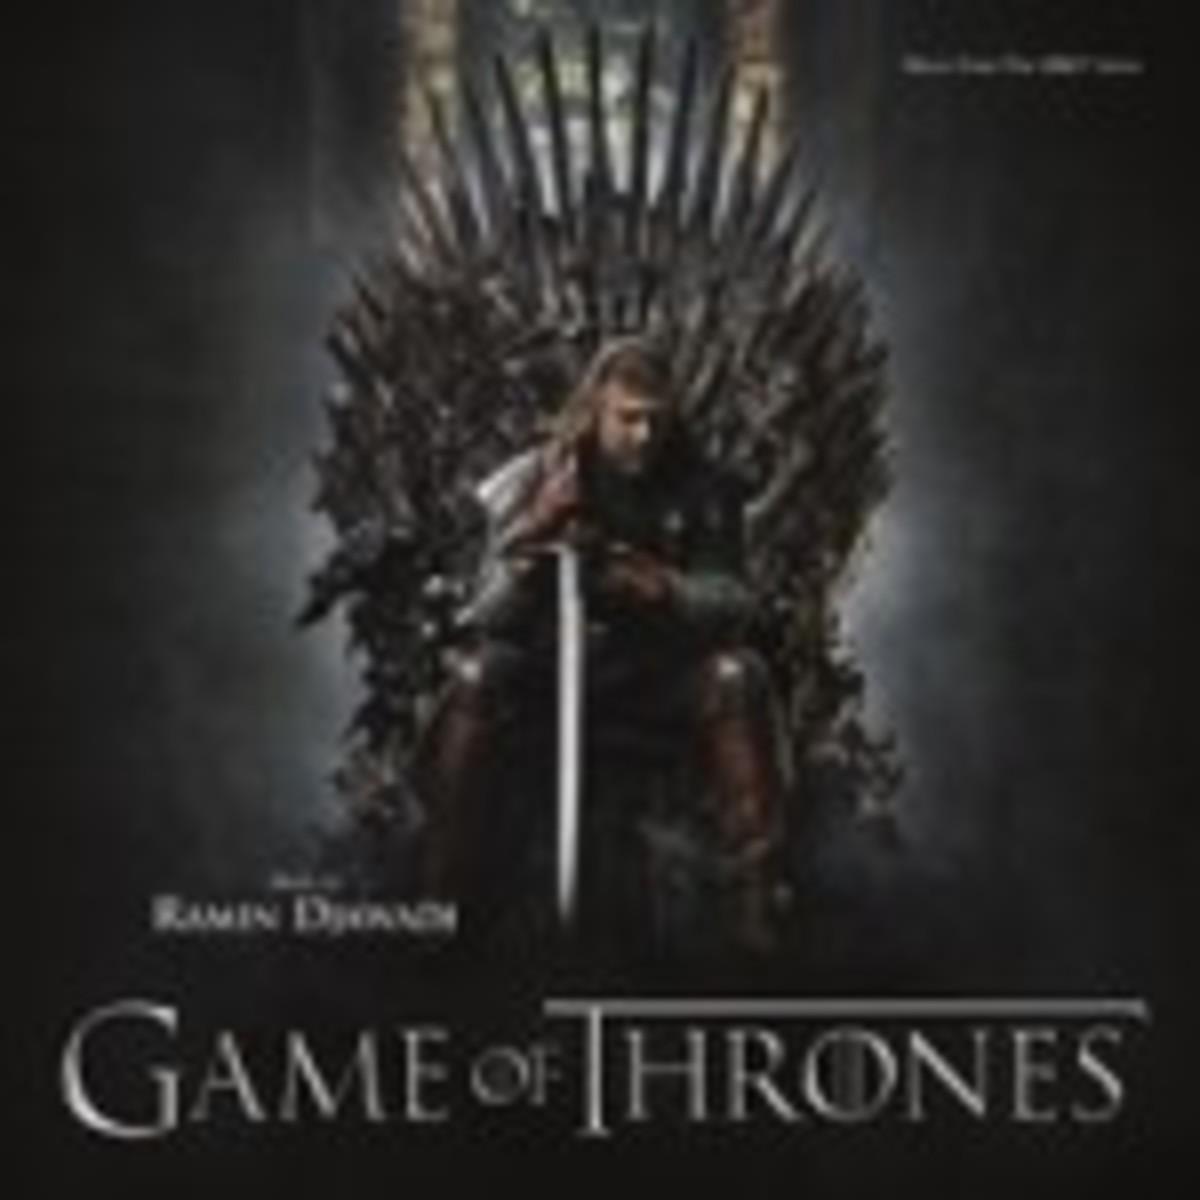 Game of Thrones soundtrack on vinyl